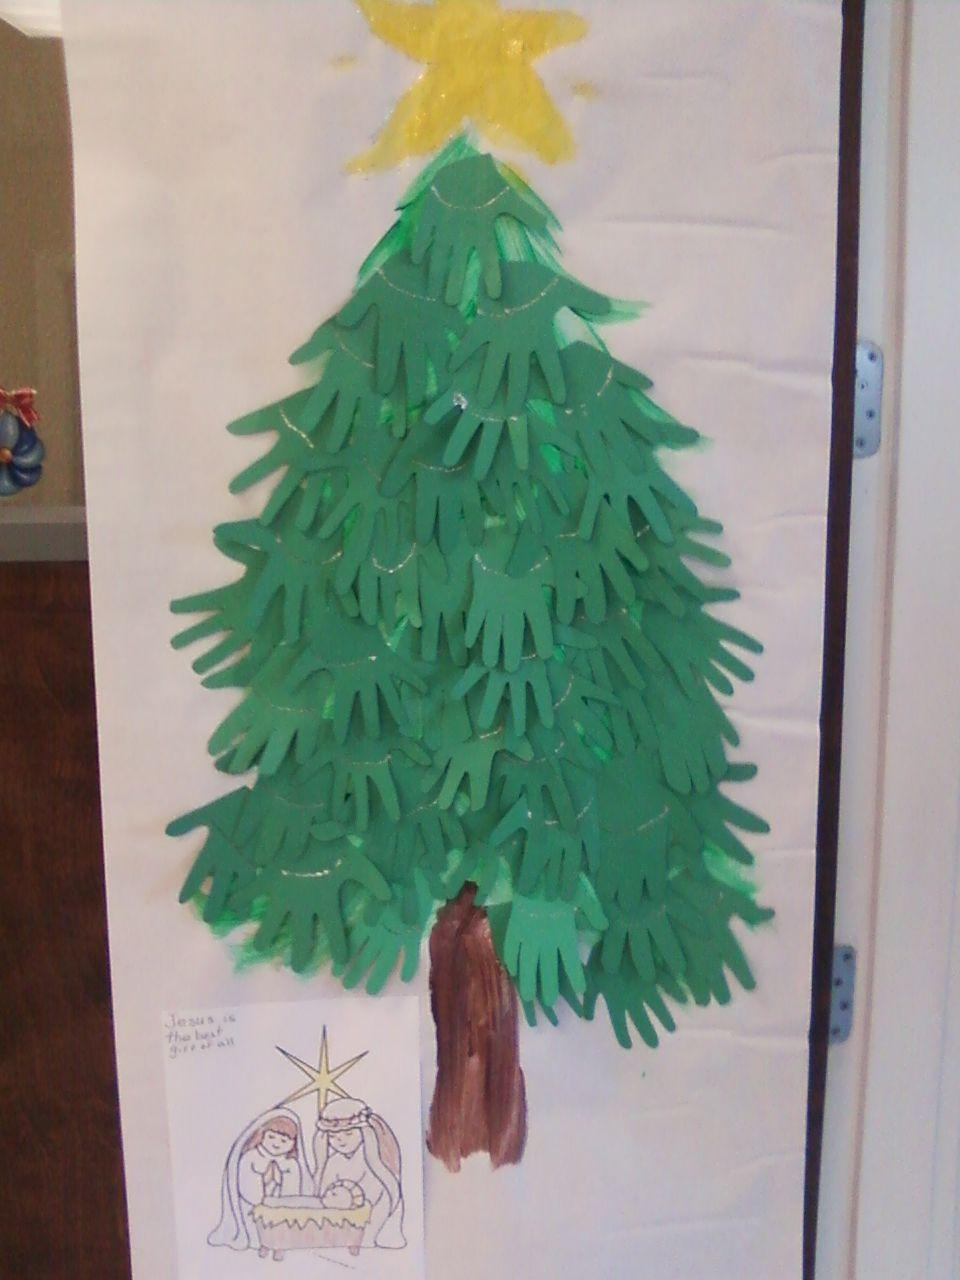 Same Christmas tree Classroom door decoration, different year